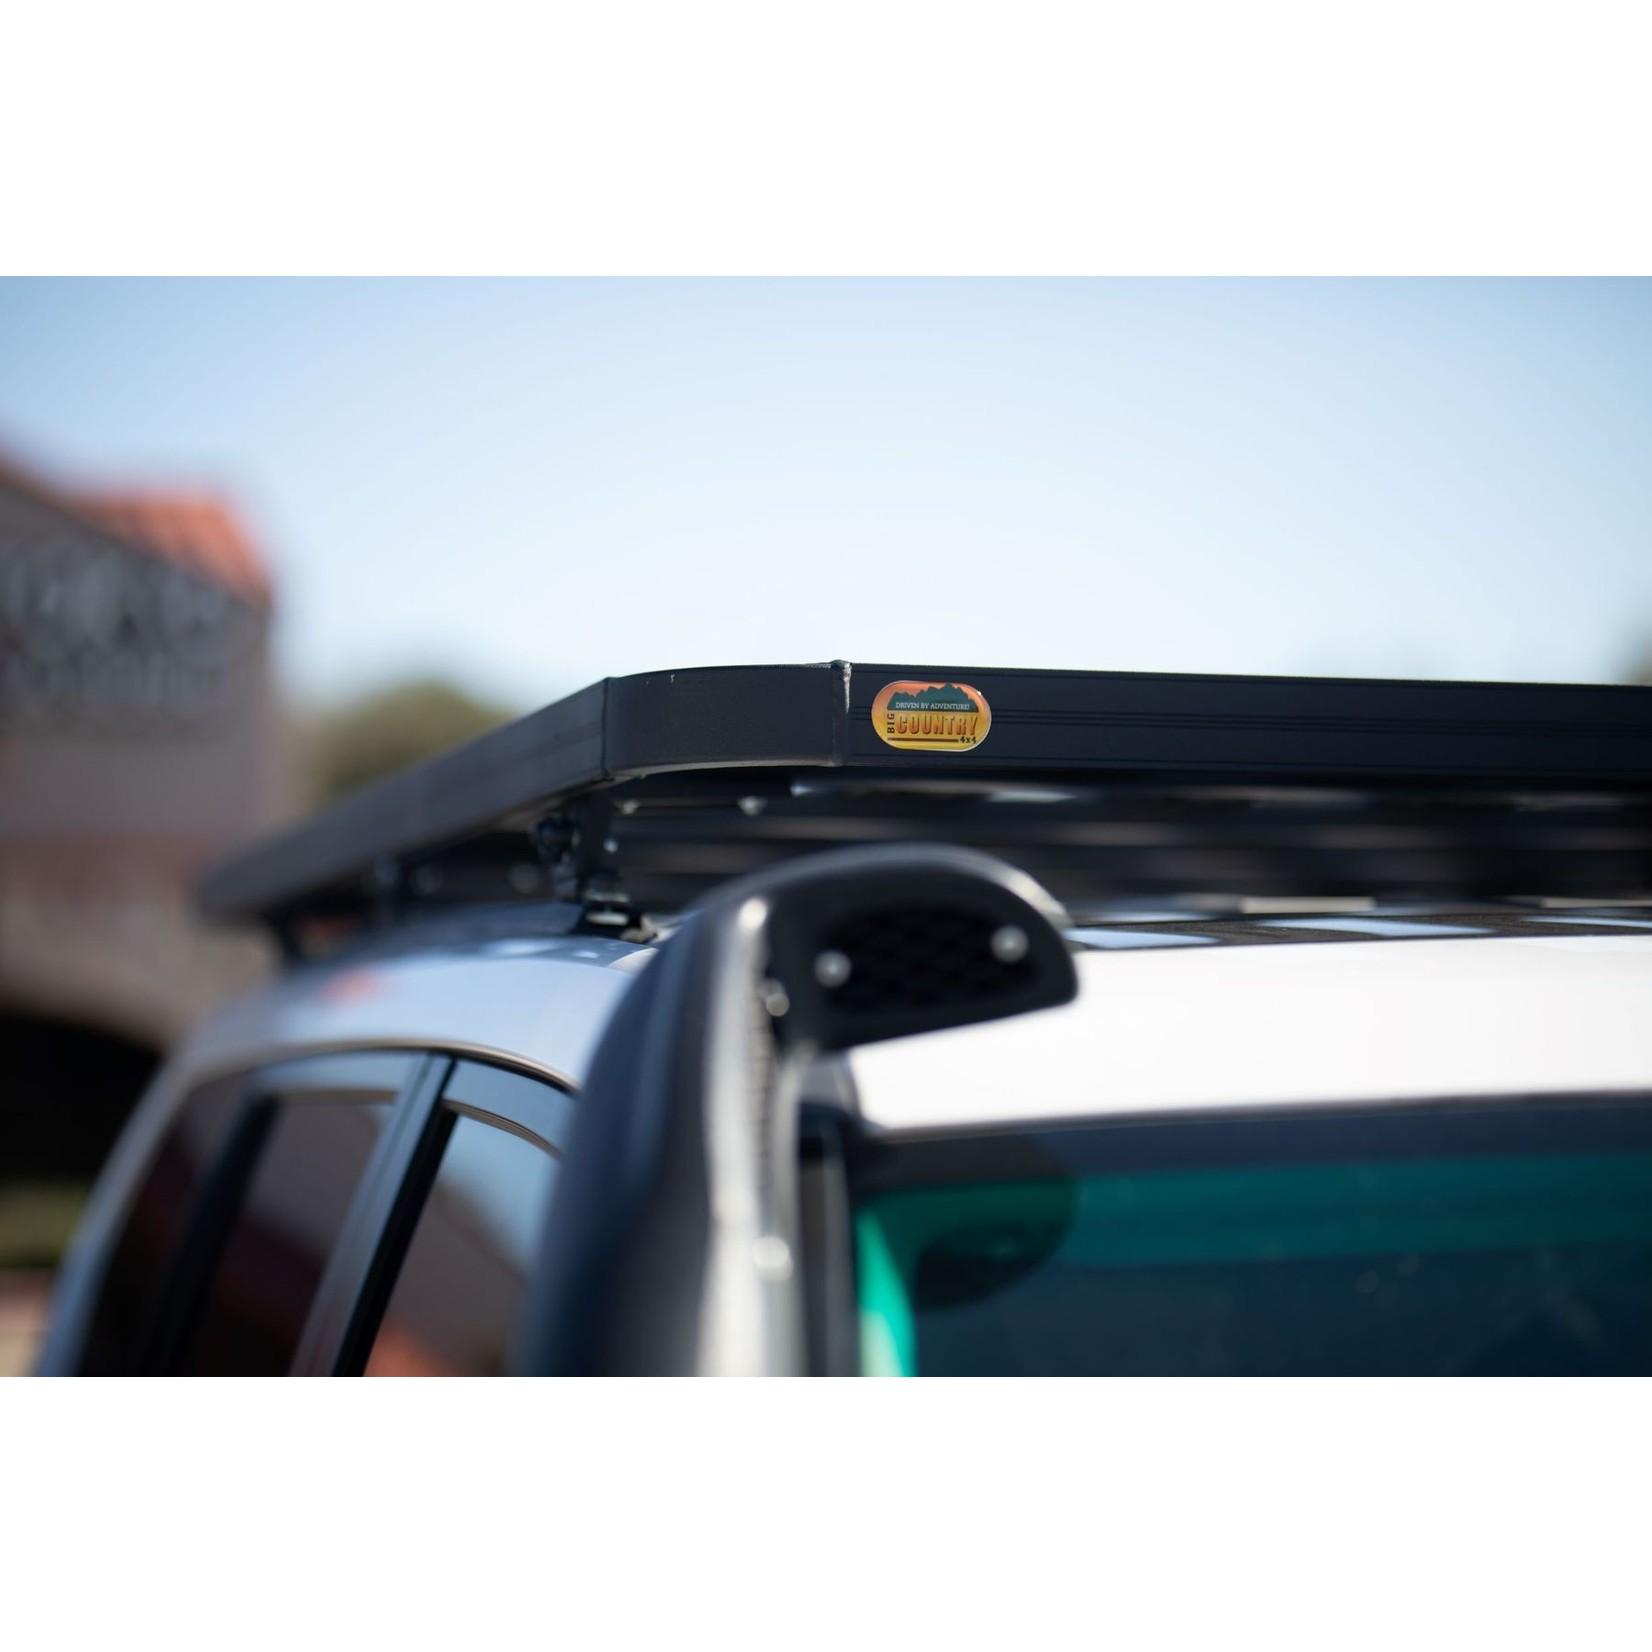 Big Country 4x4 Big Country 4x4 Lexus GX 460 Roof Rack